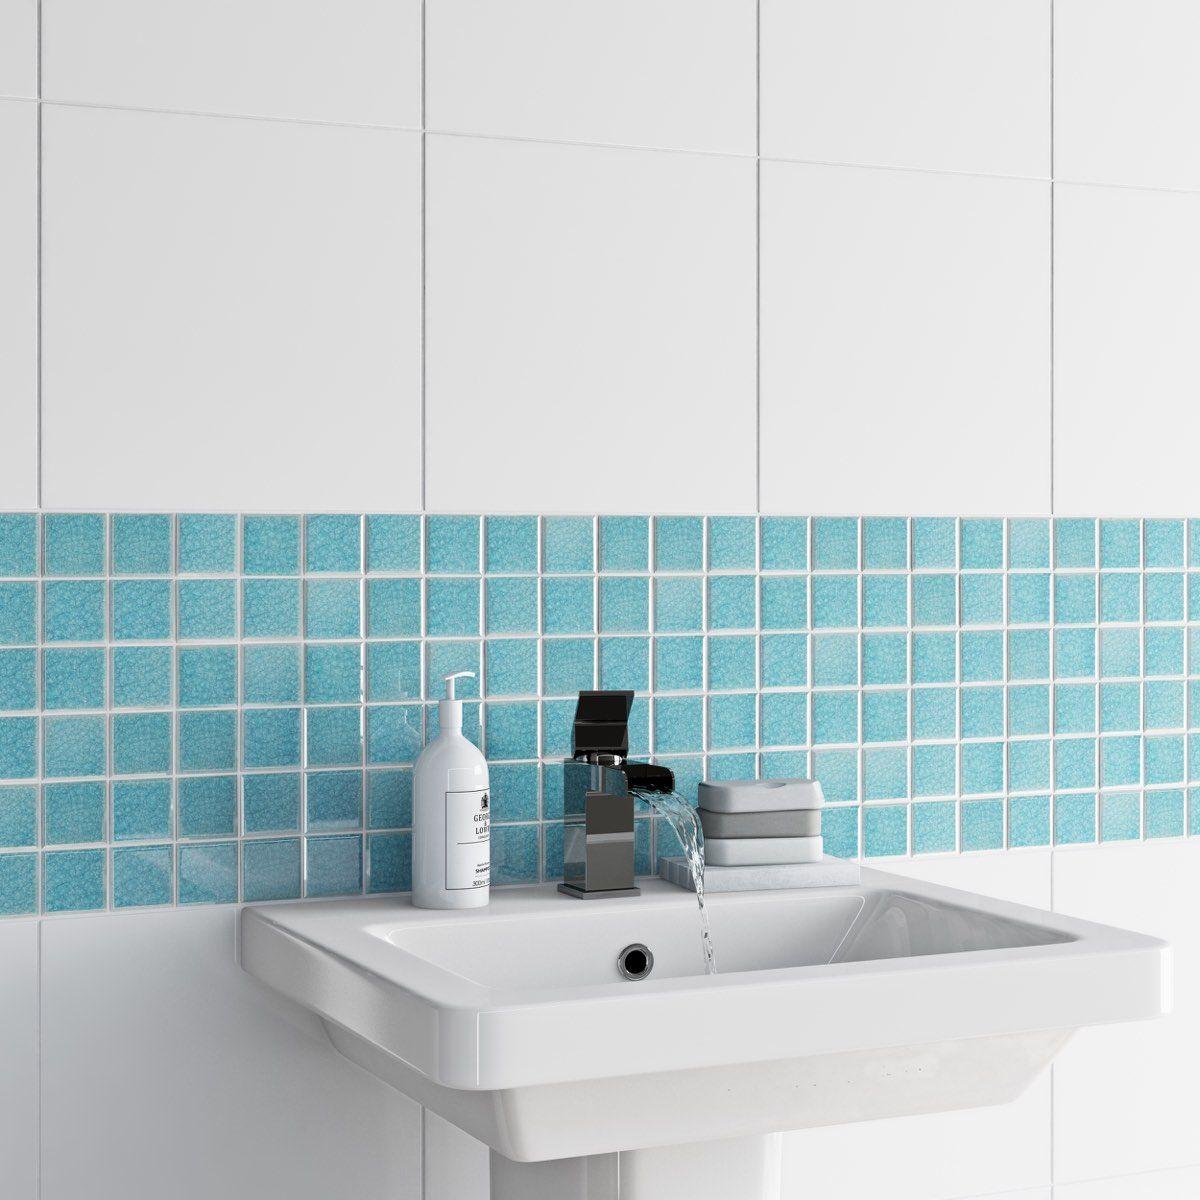 Mosaic iridescent sea tile 305mm x 305mm - 1 sheet | Bathroom ...